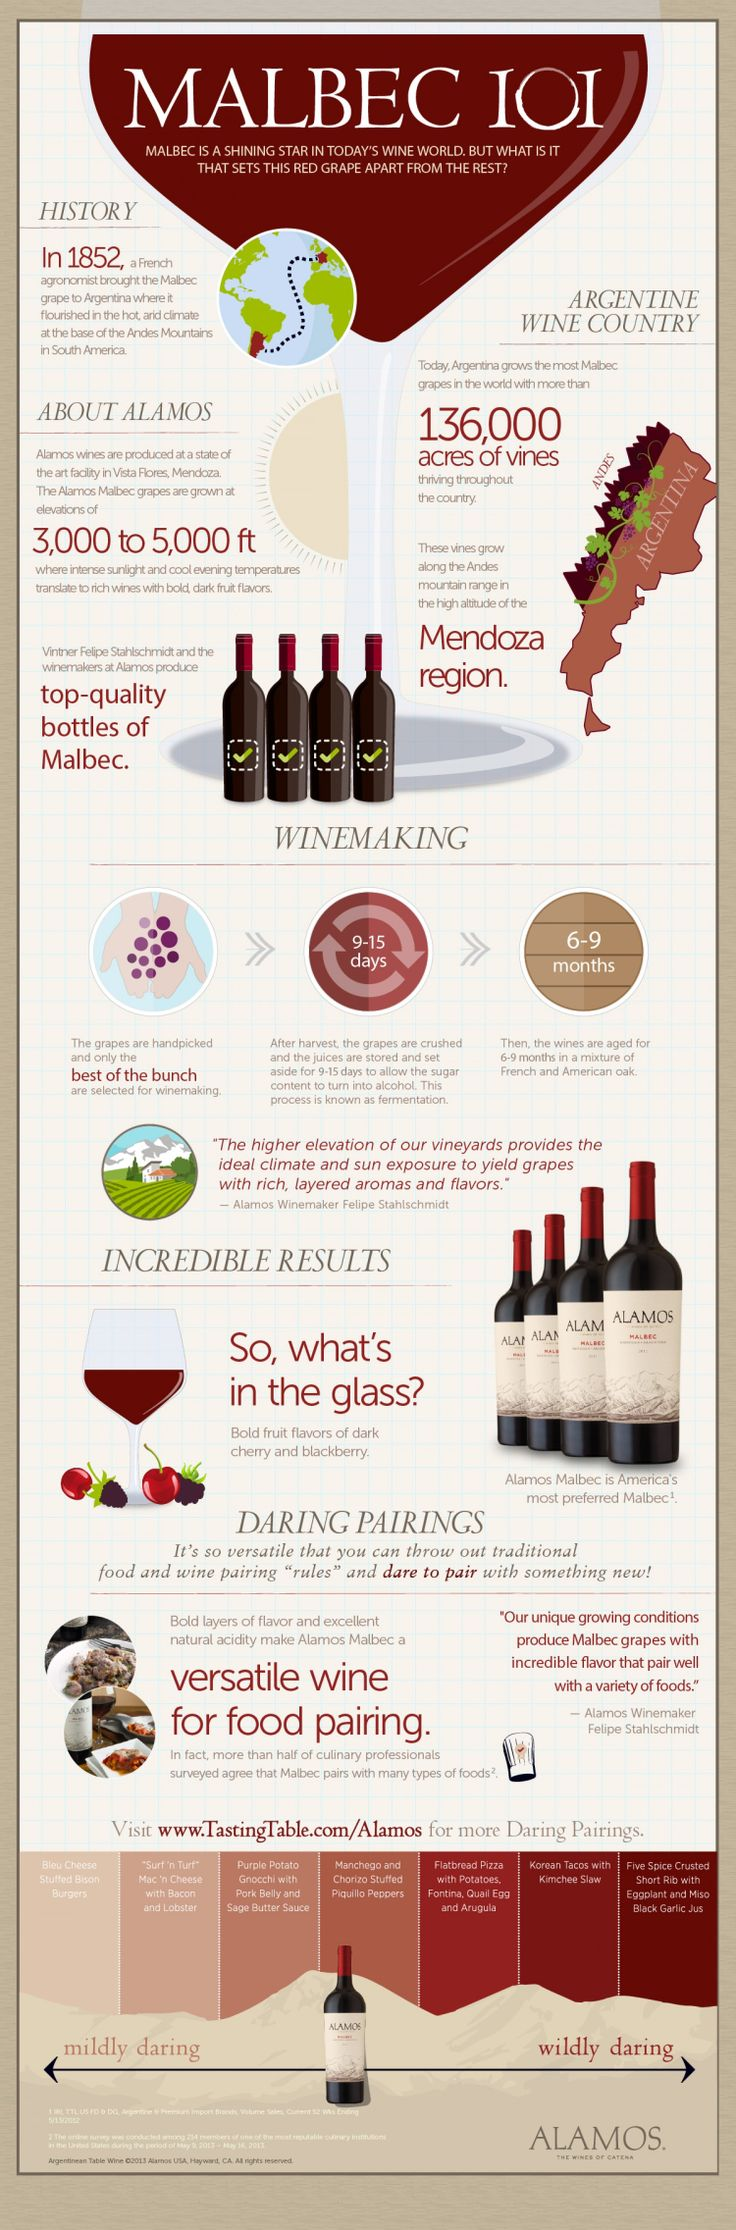 #wine #malbec